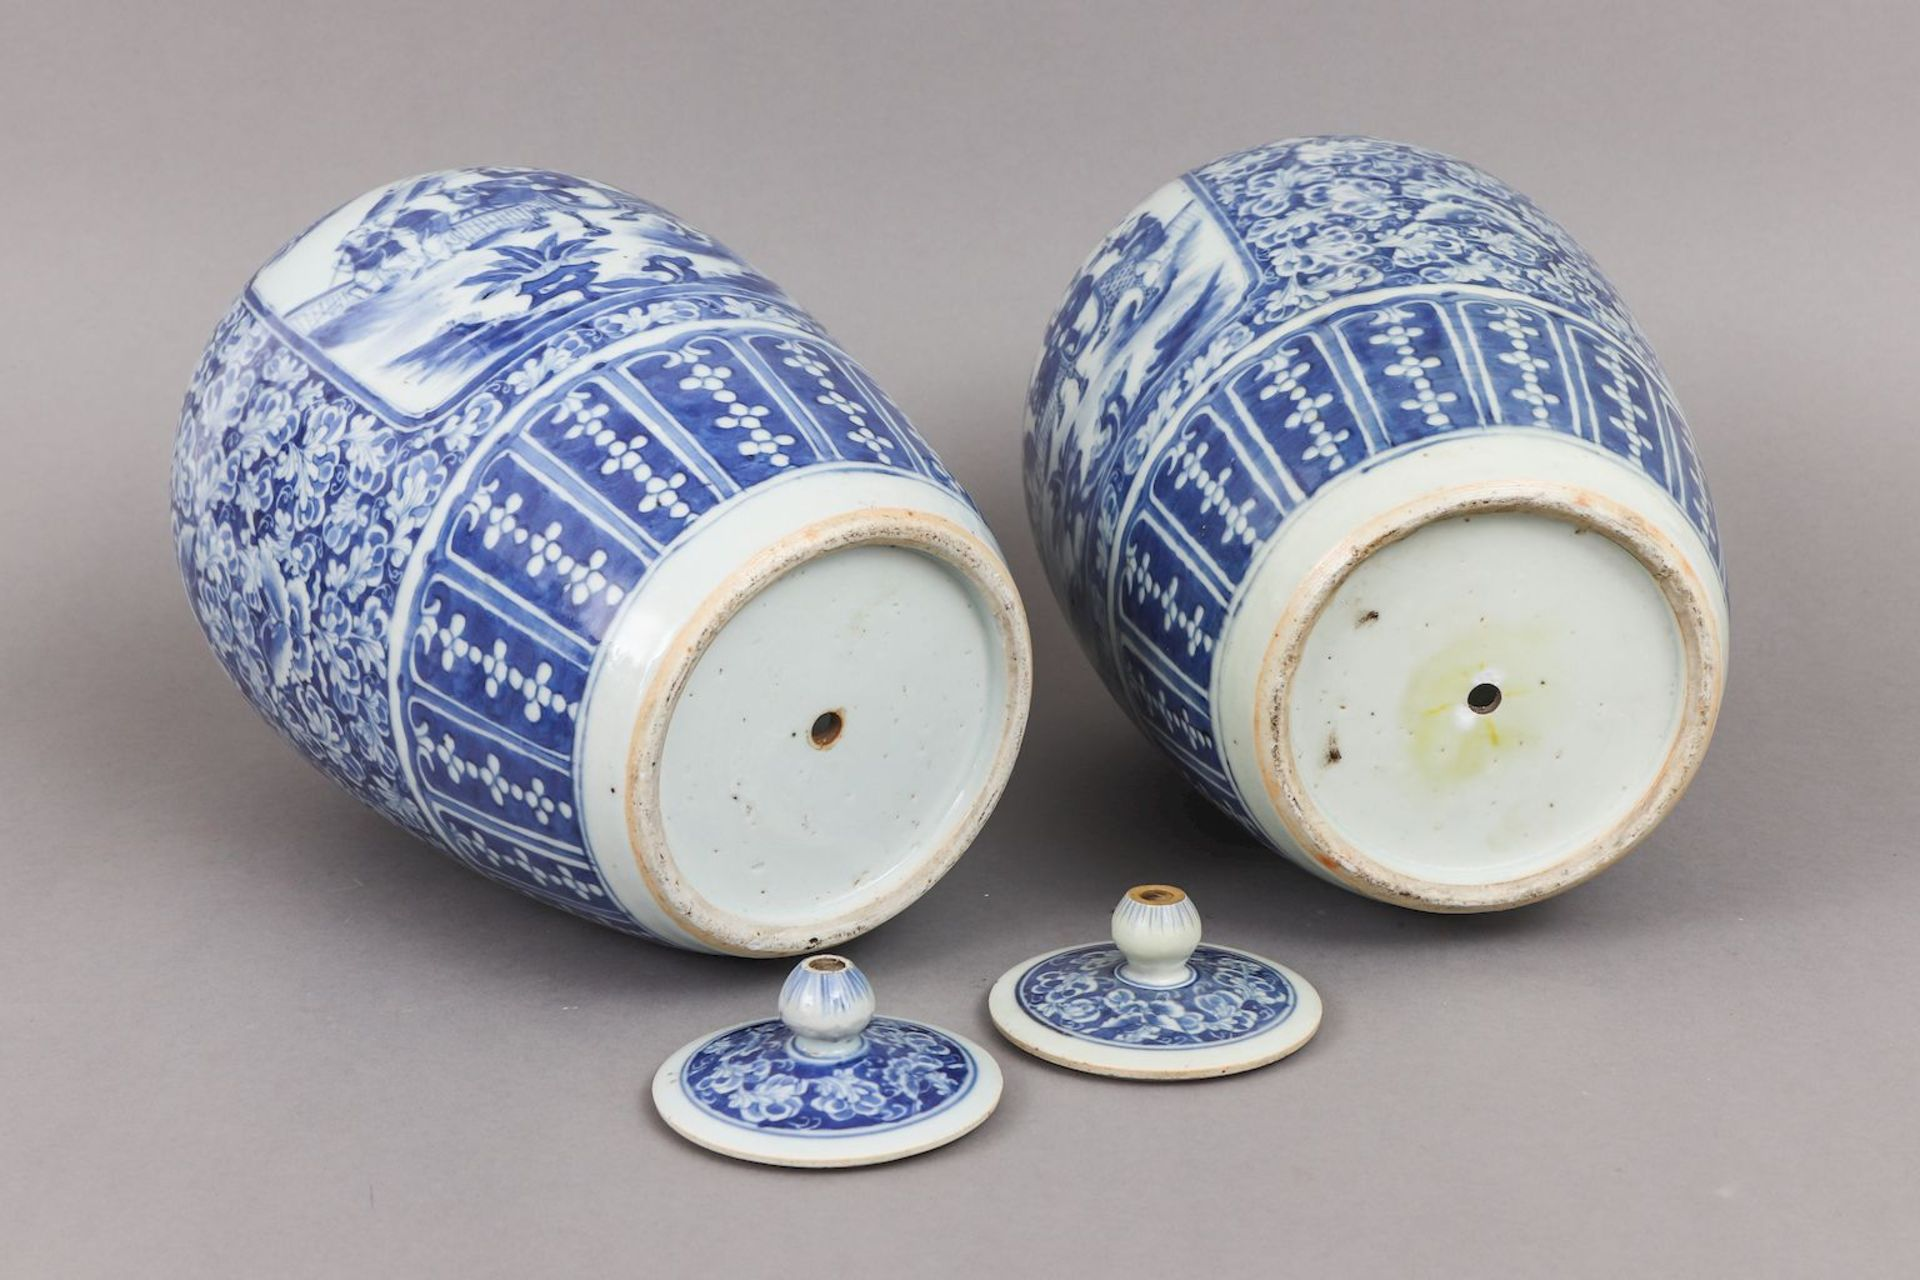 Paar chinesische Vorratsgefäße der Qing Dynastie (1644-1912) - Image 3 of 4